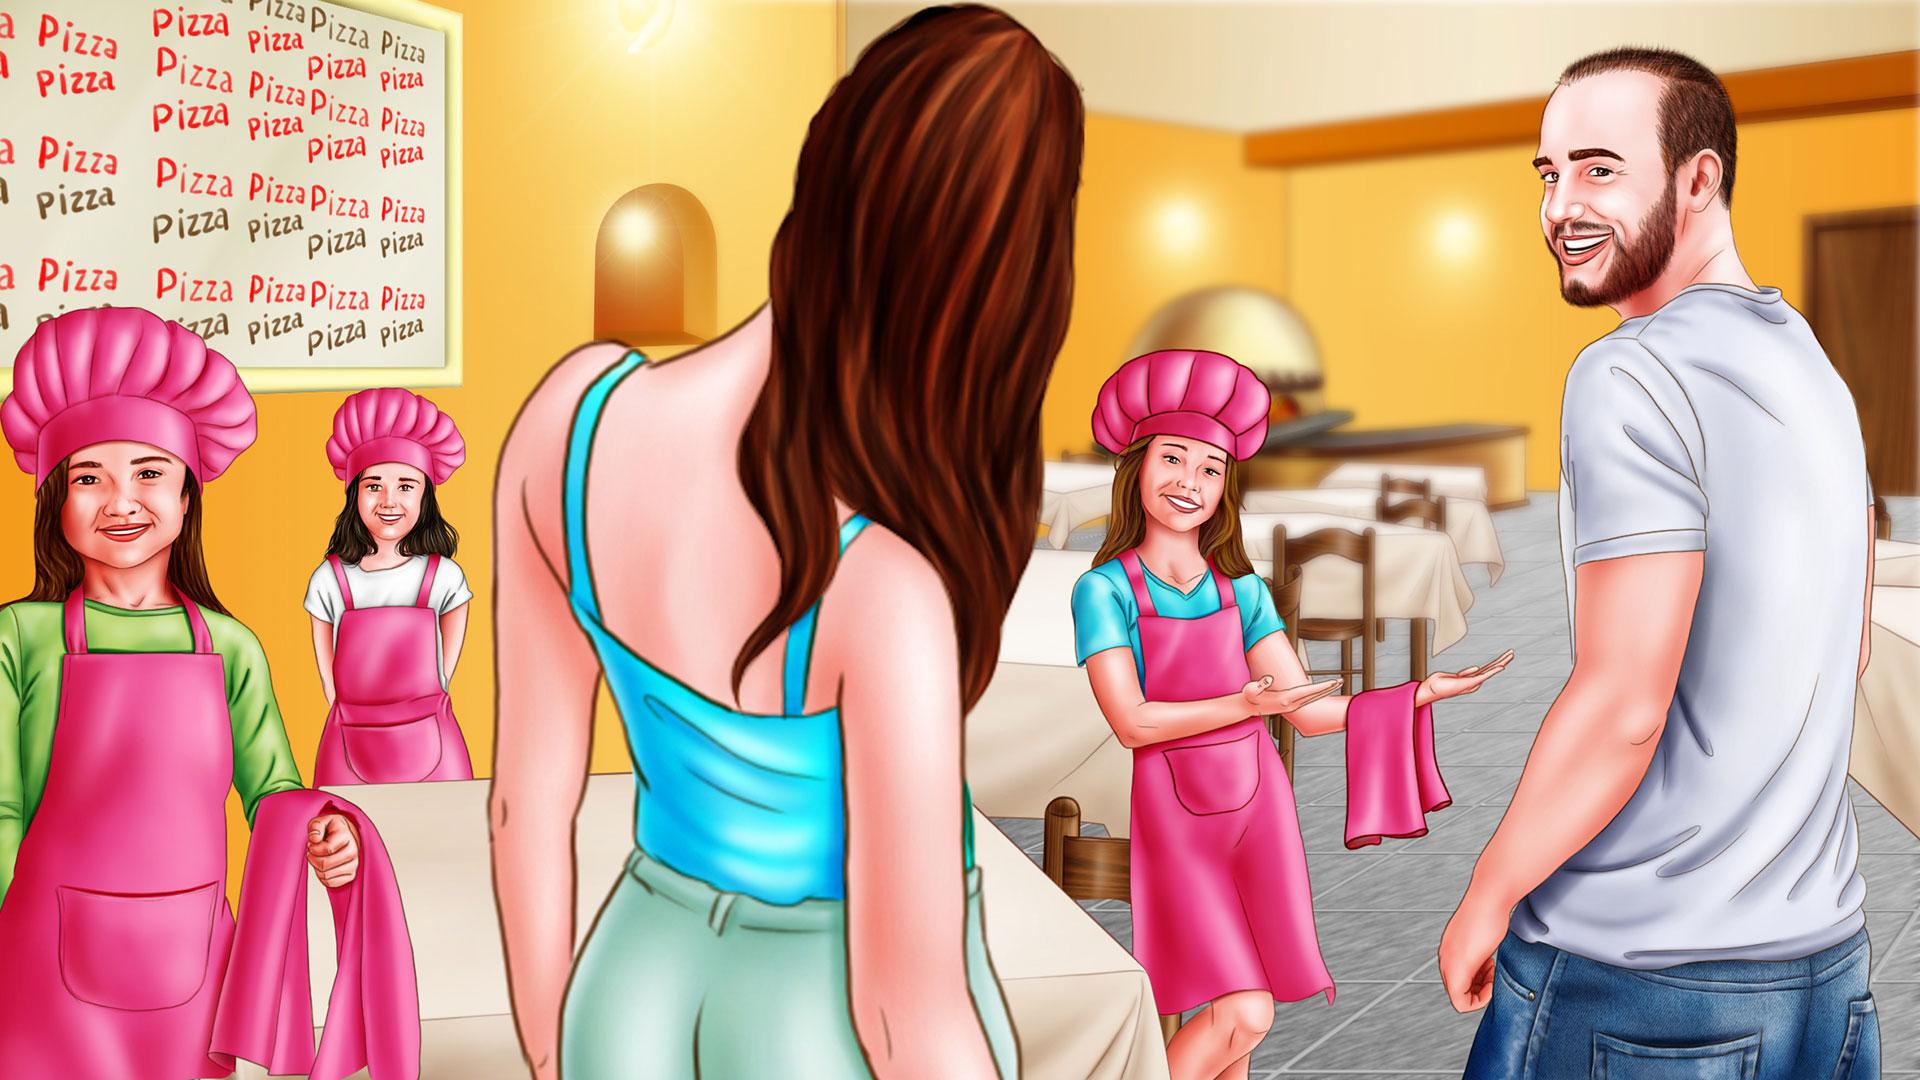 Storyboard Barbie Pizzaiola